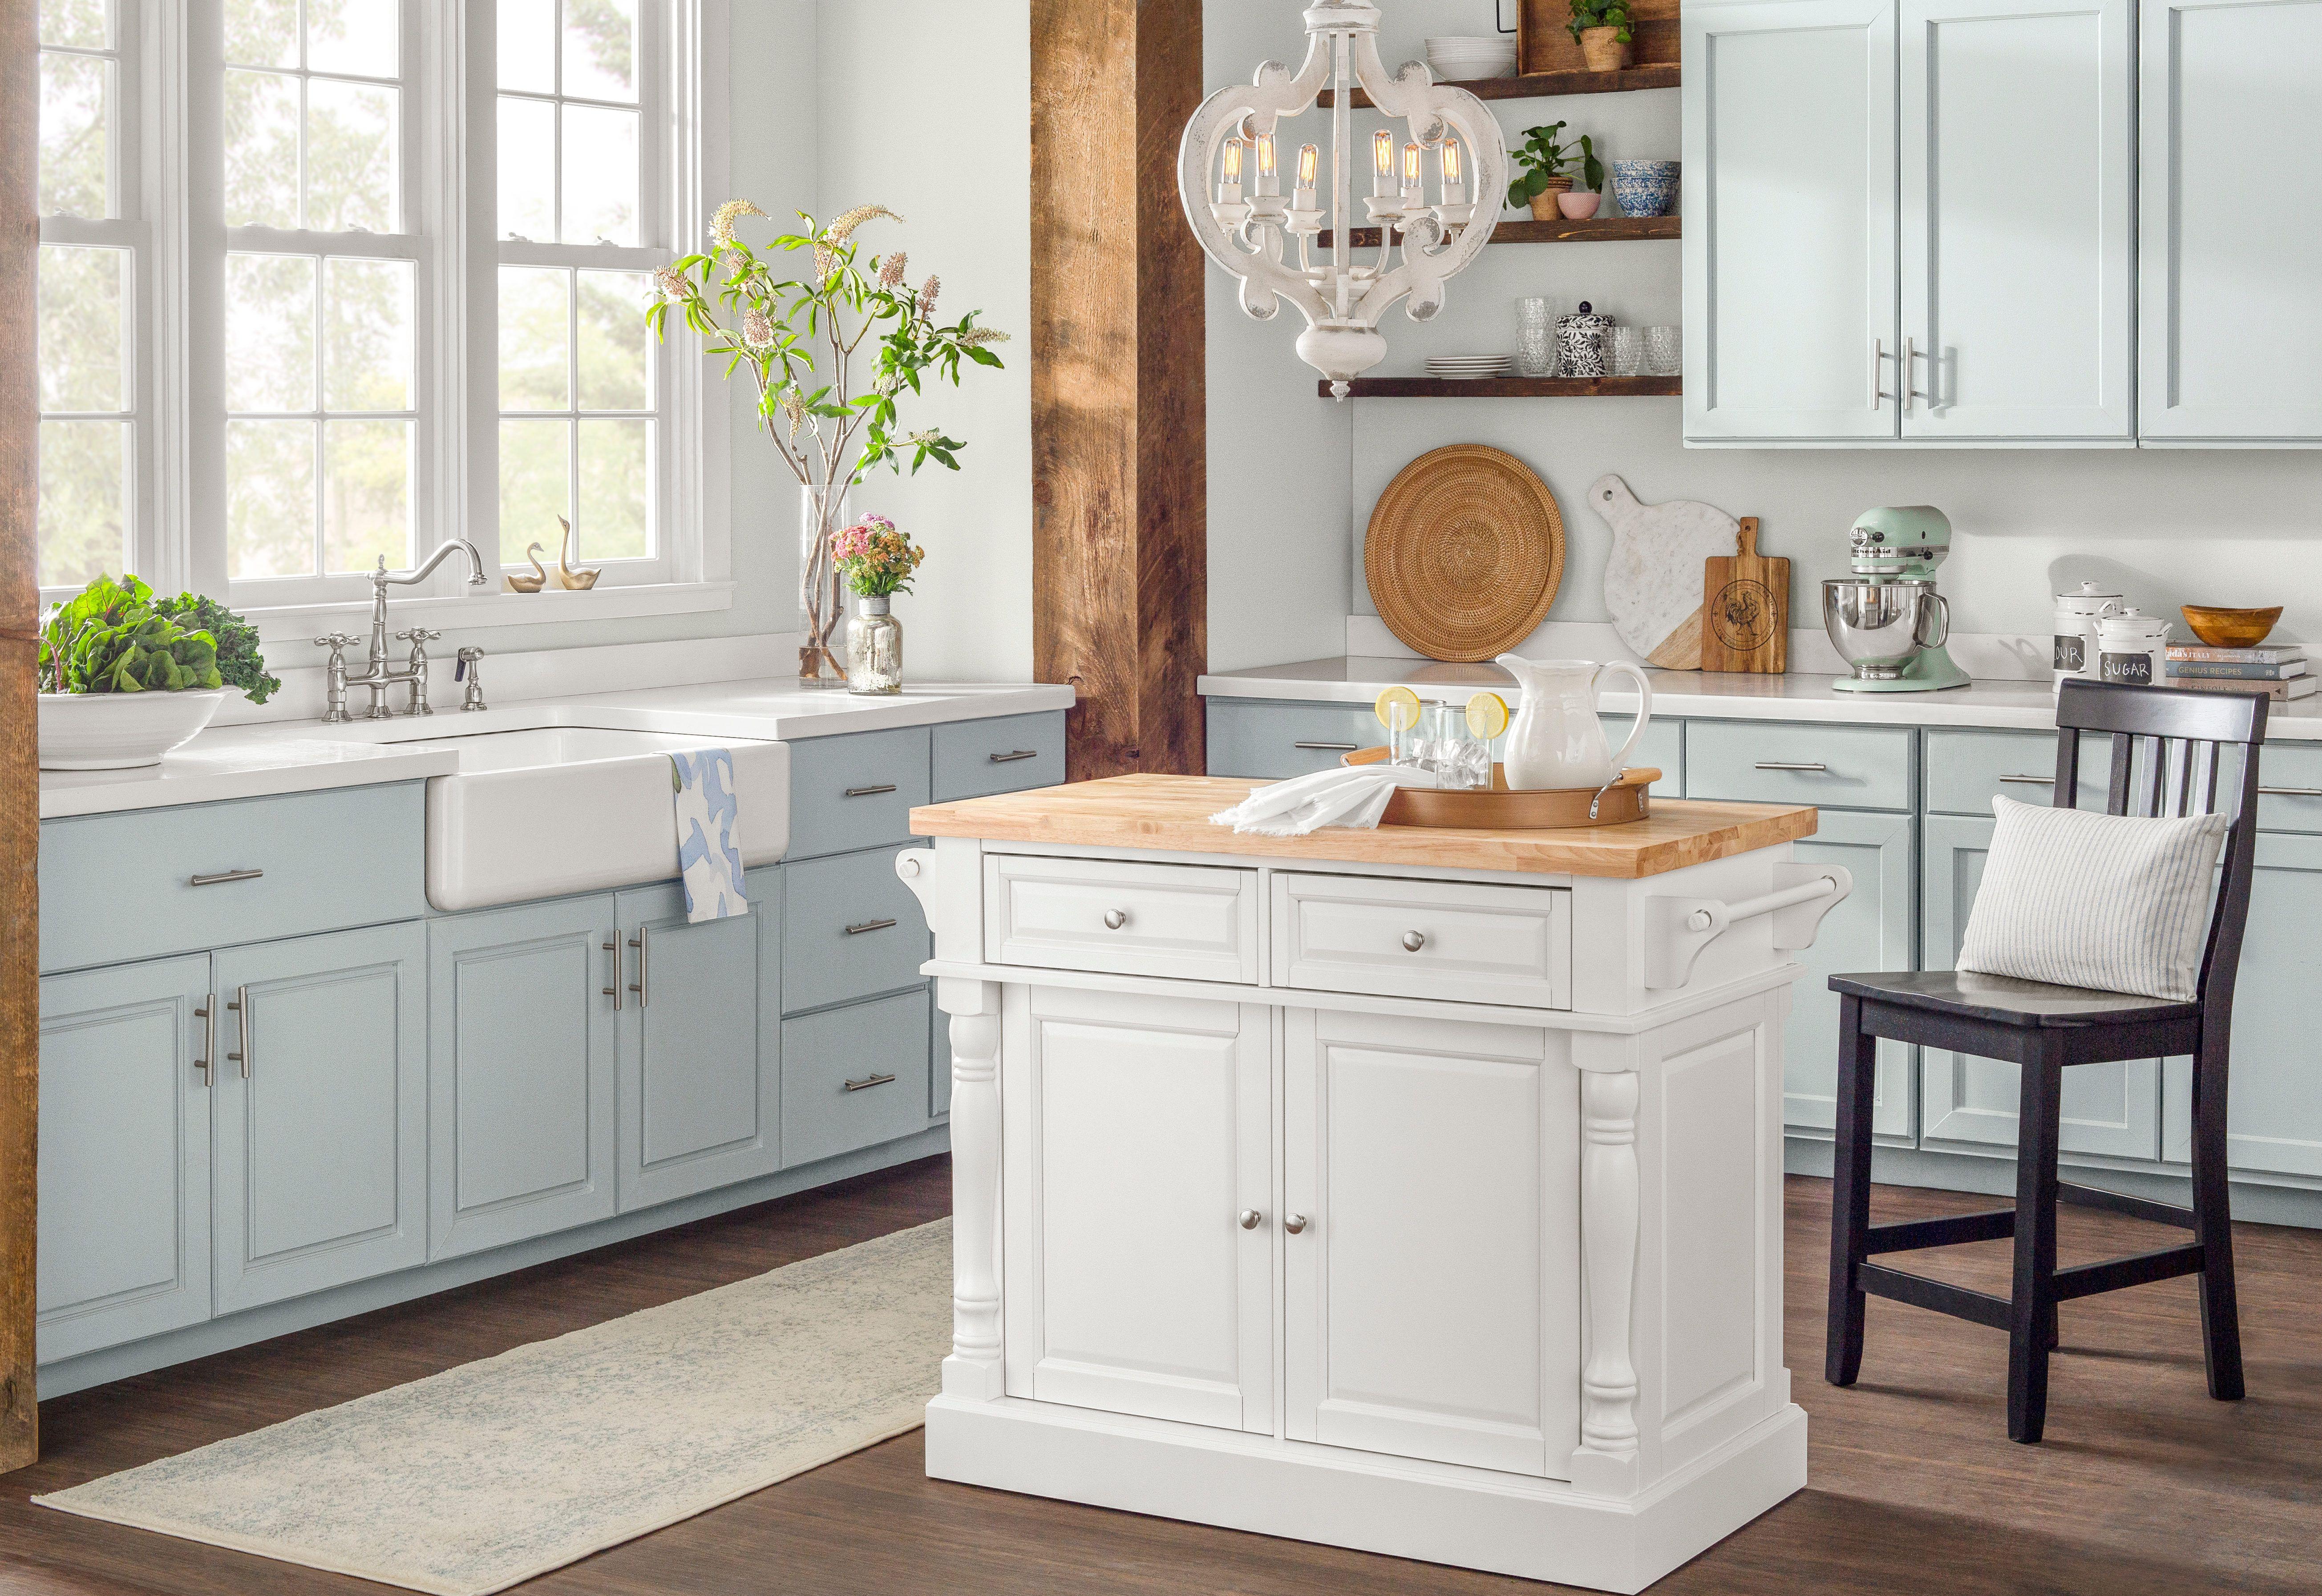 Modern Farmhouse Kitchen Design Kitchen Cabinets For Sale Kitchen Design Old Farmhouse Kitchen